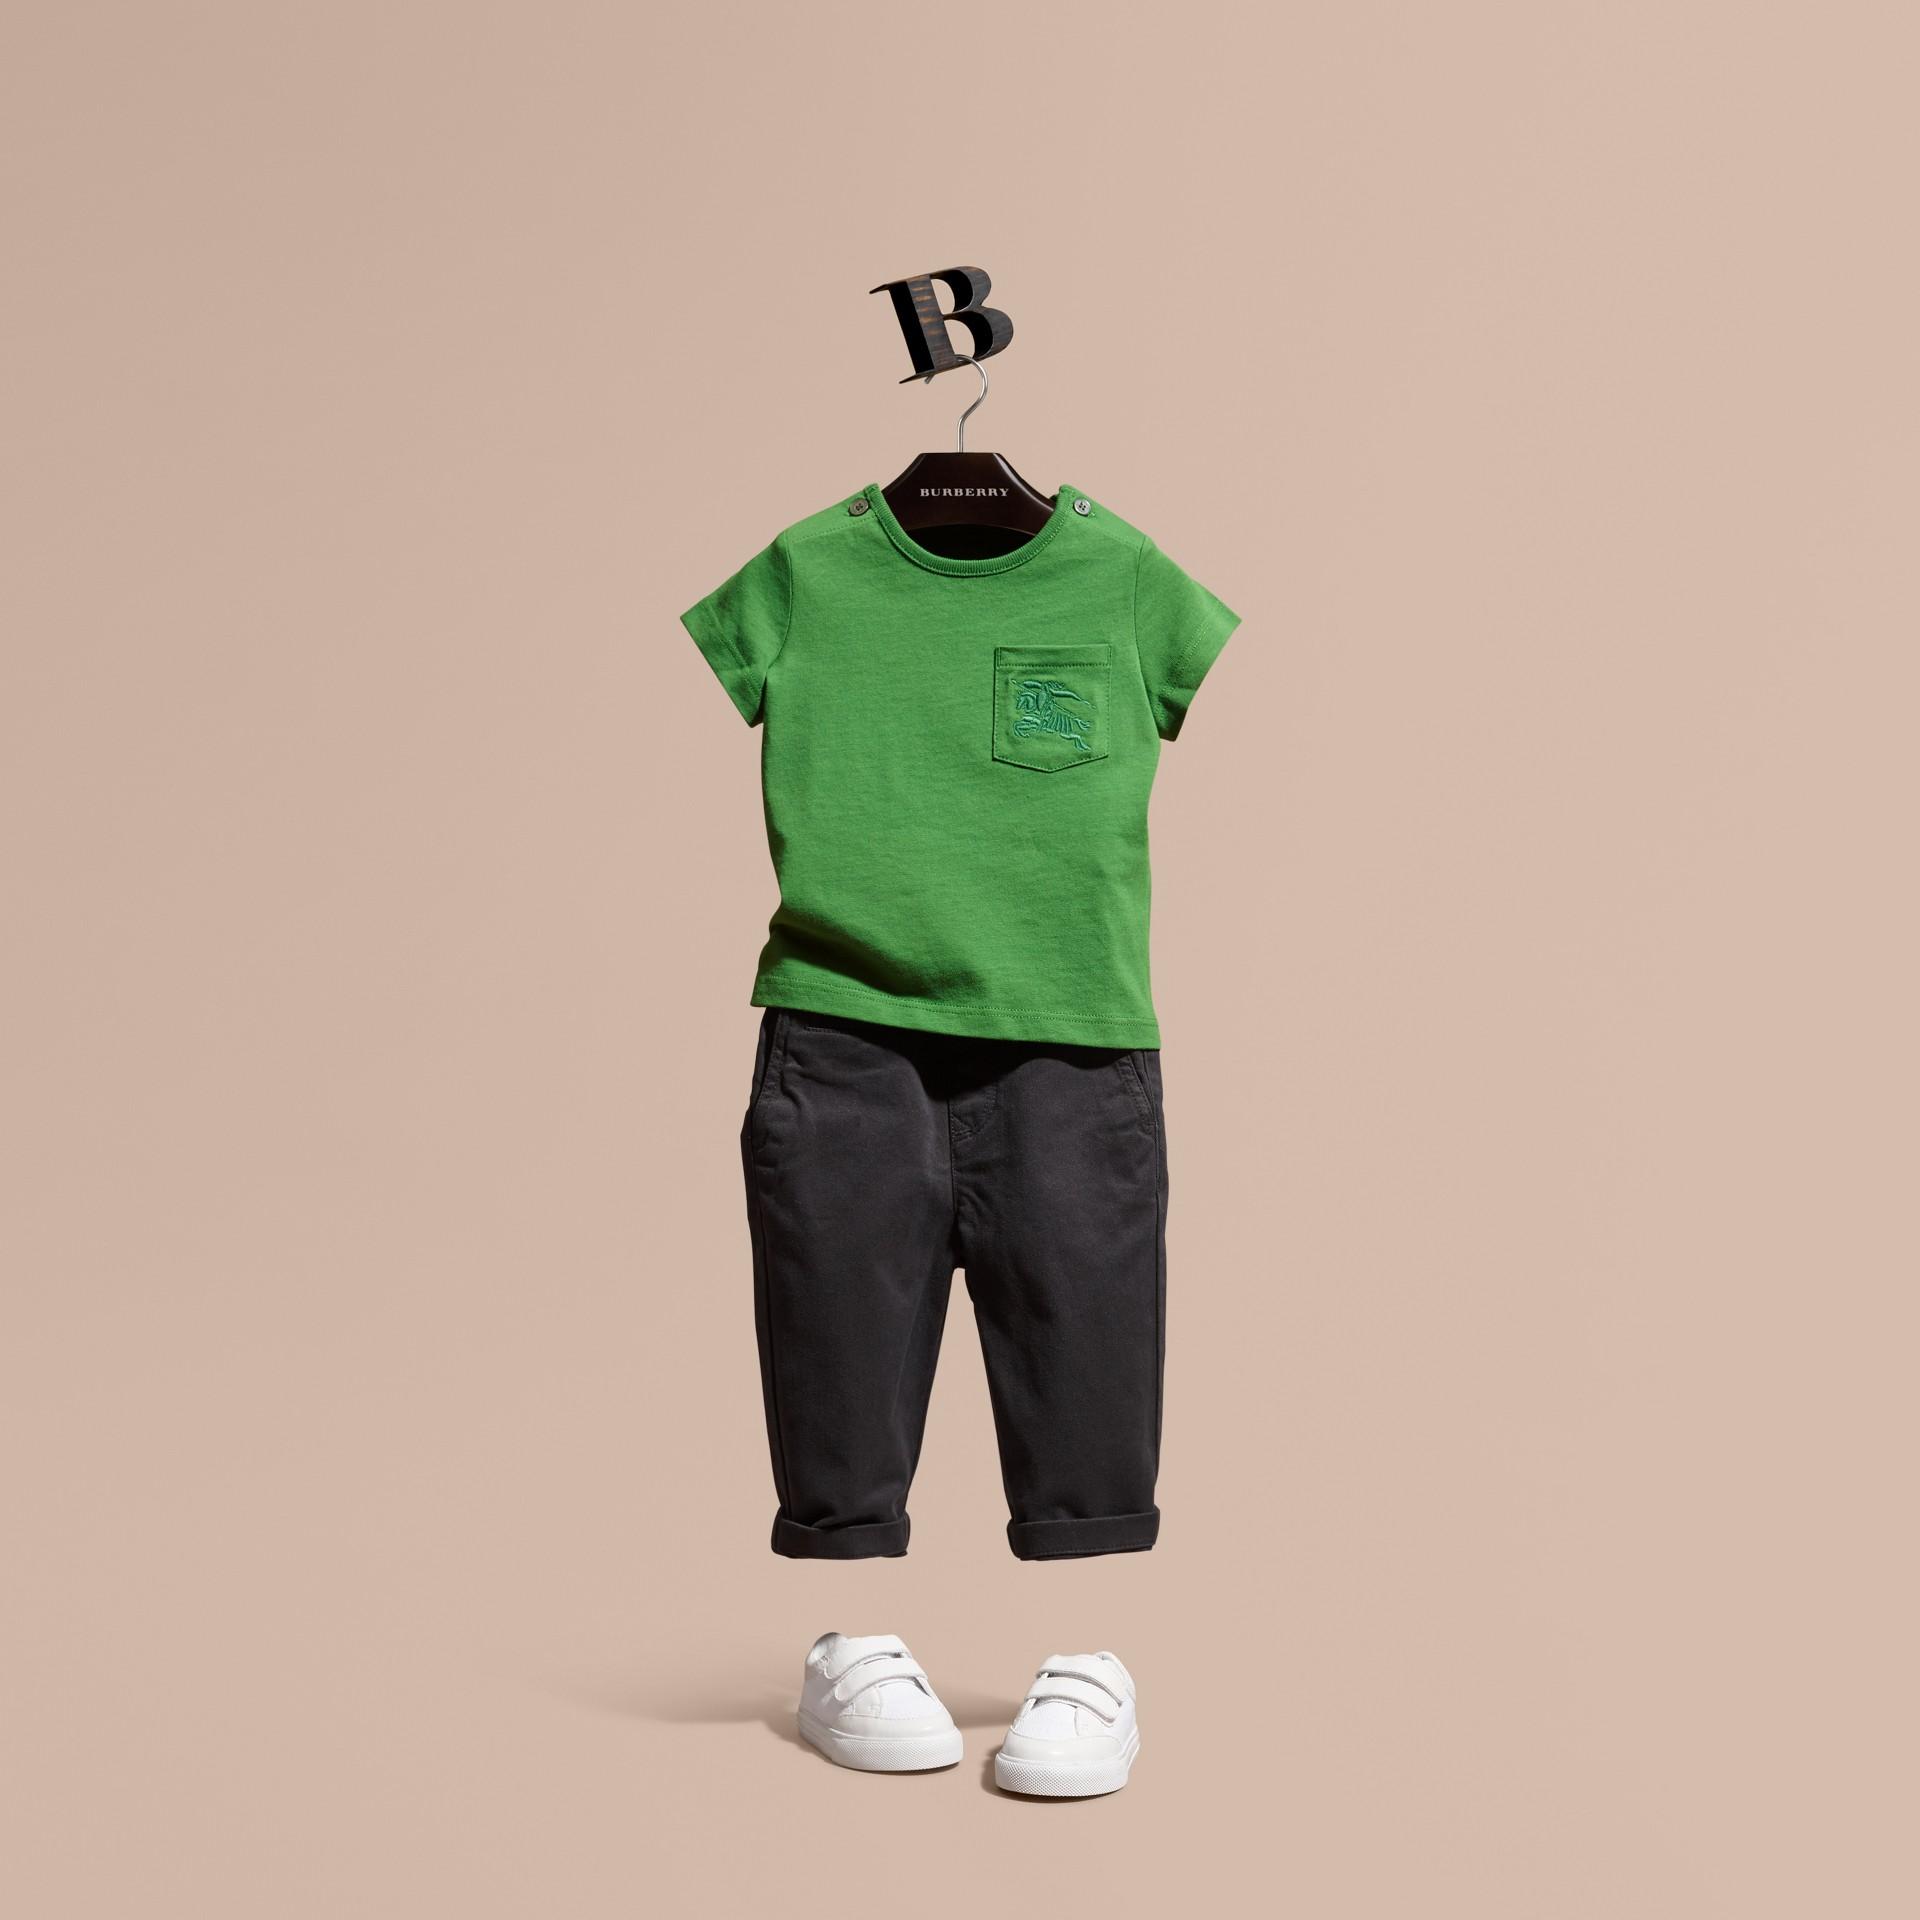 Verde felce brillante T-shirt girocollo in cotone Verde Felce Brillante - immagine della galleria 1